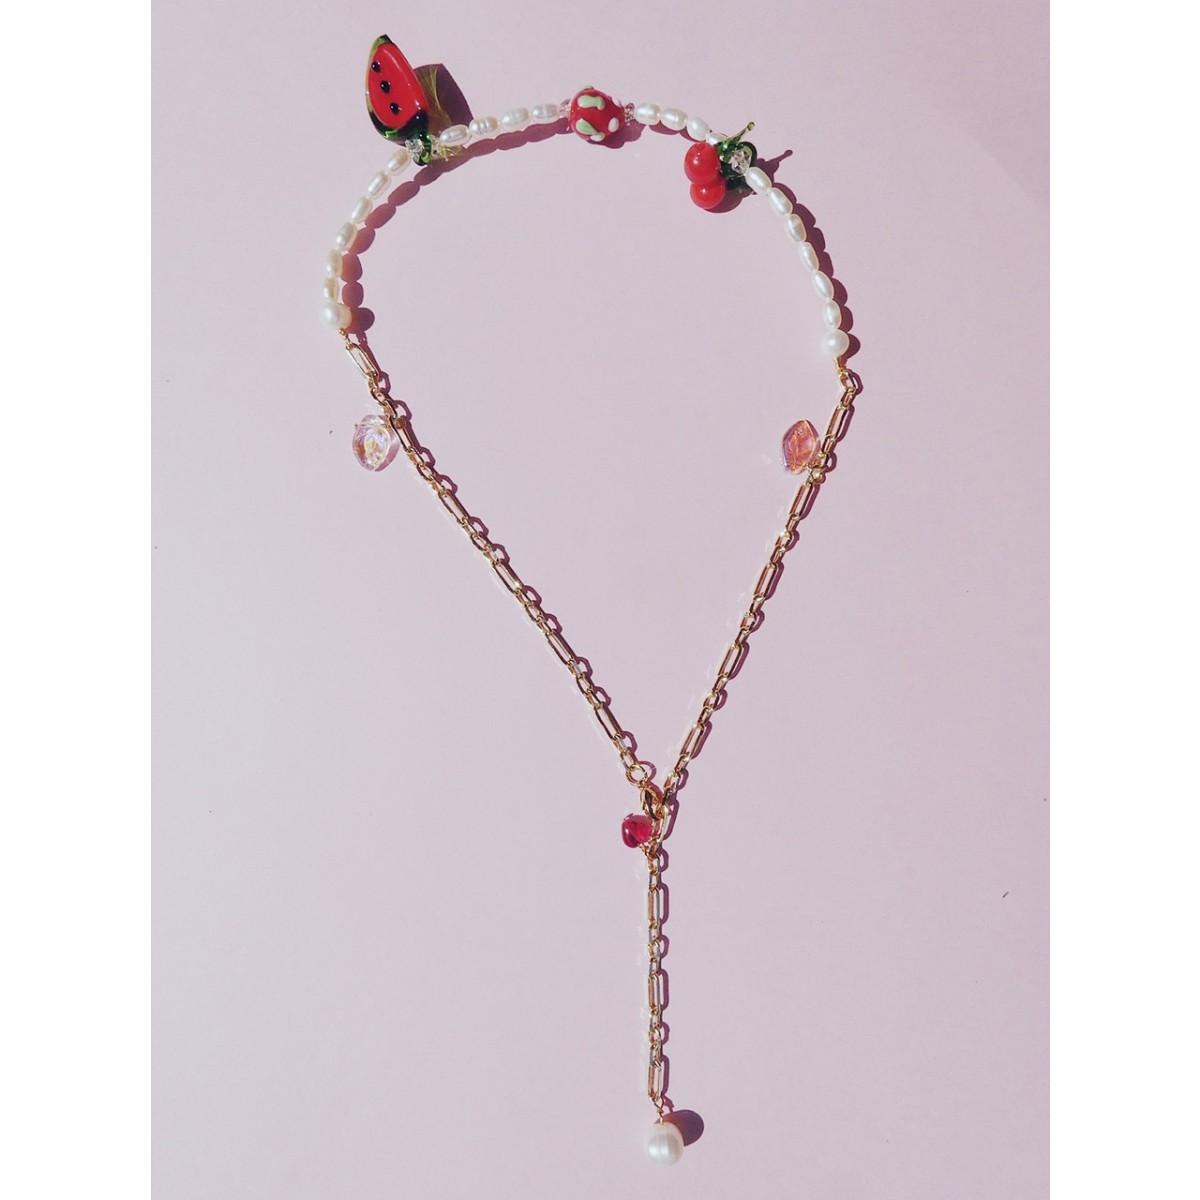 Valerie Chic - HAPPY RED FRUITS Perlen Kette - 1 Kette 2 Stile